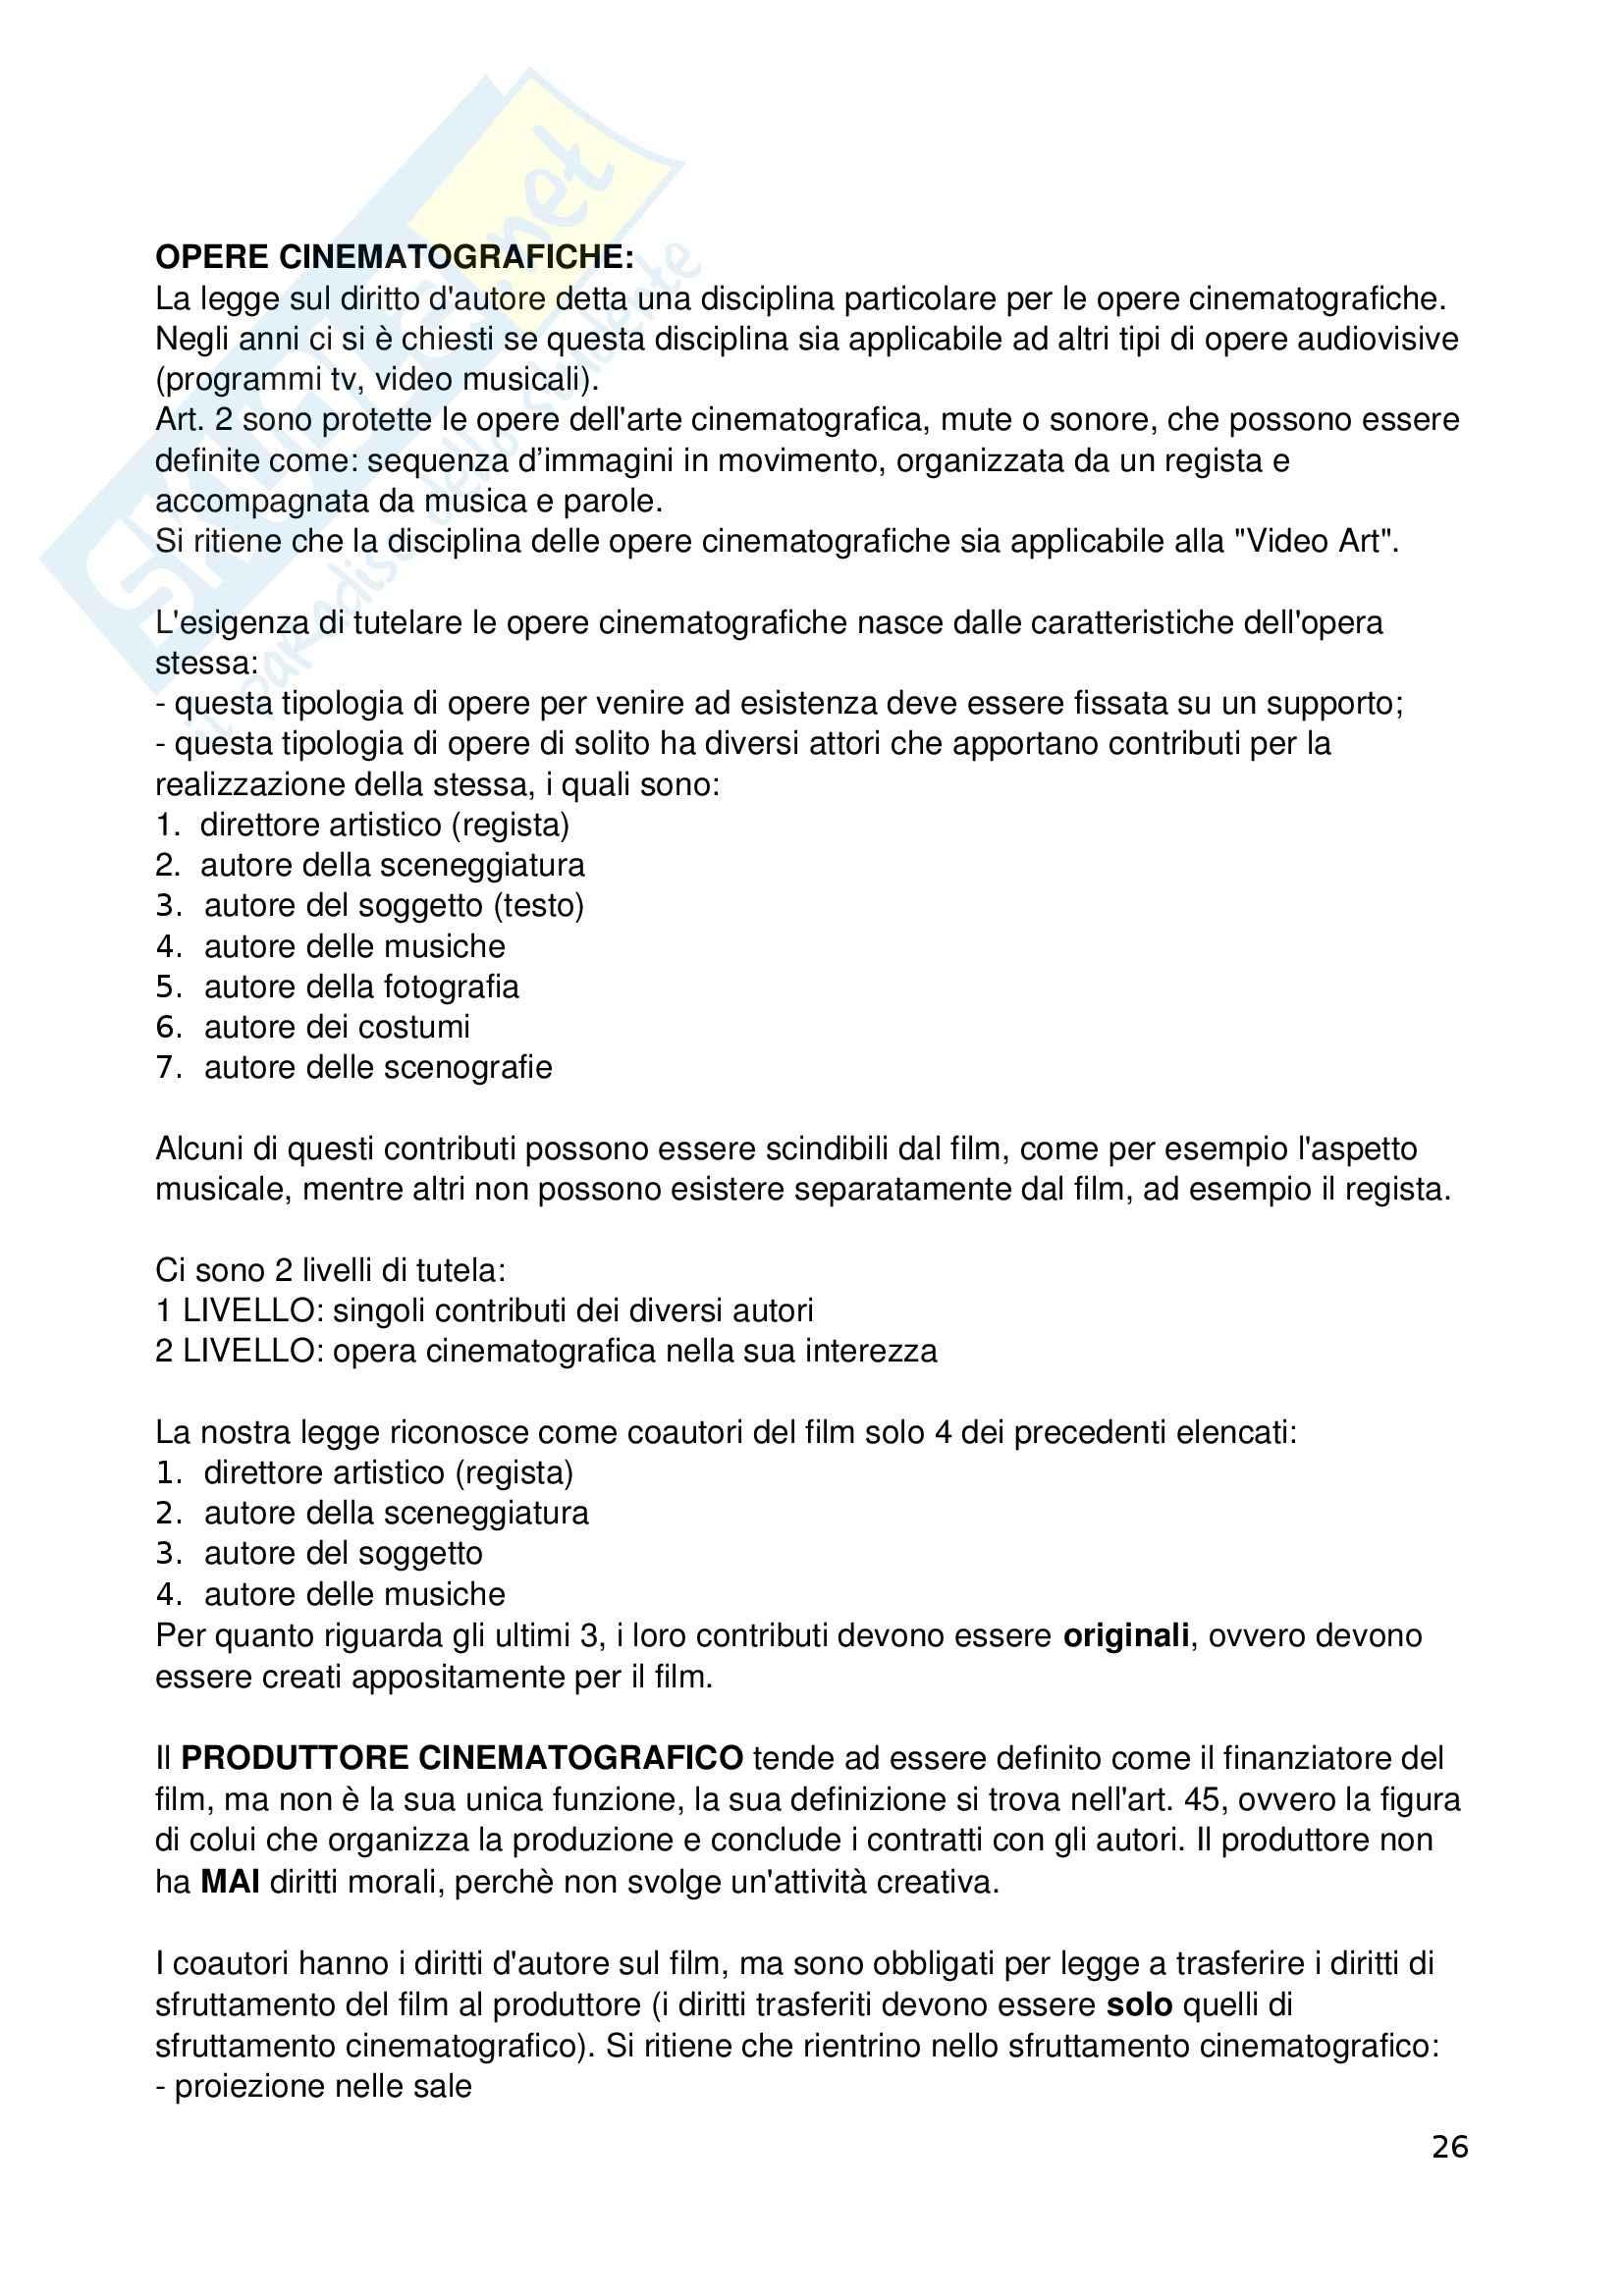 Diritto commerciale - Appunti Pag. 26